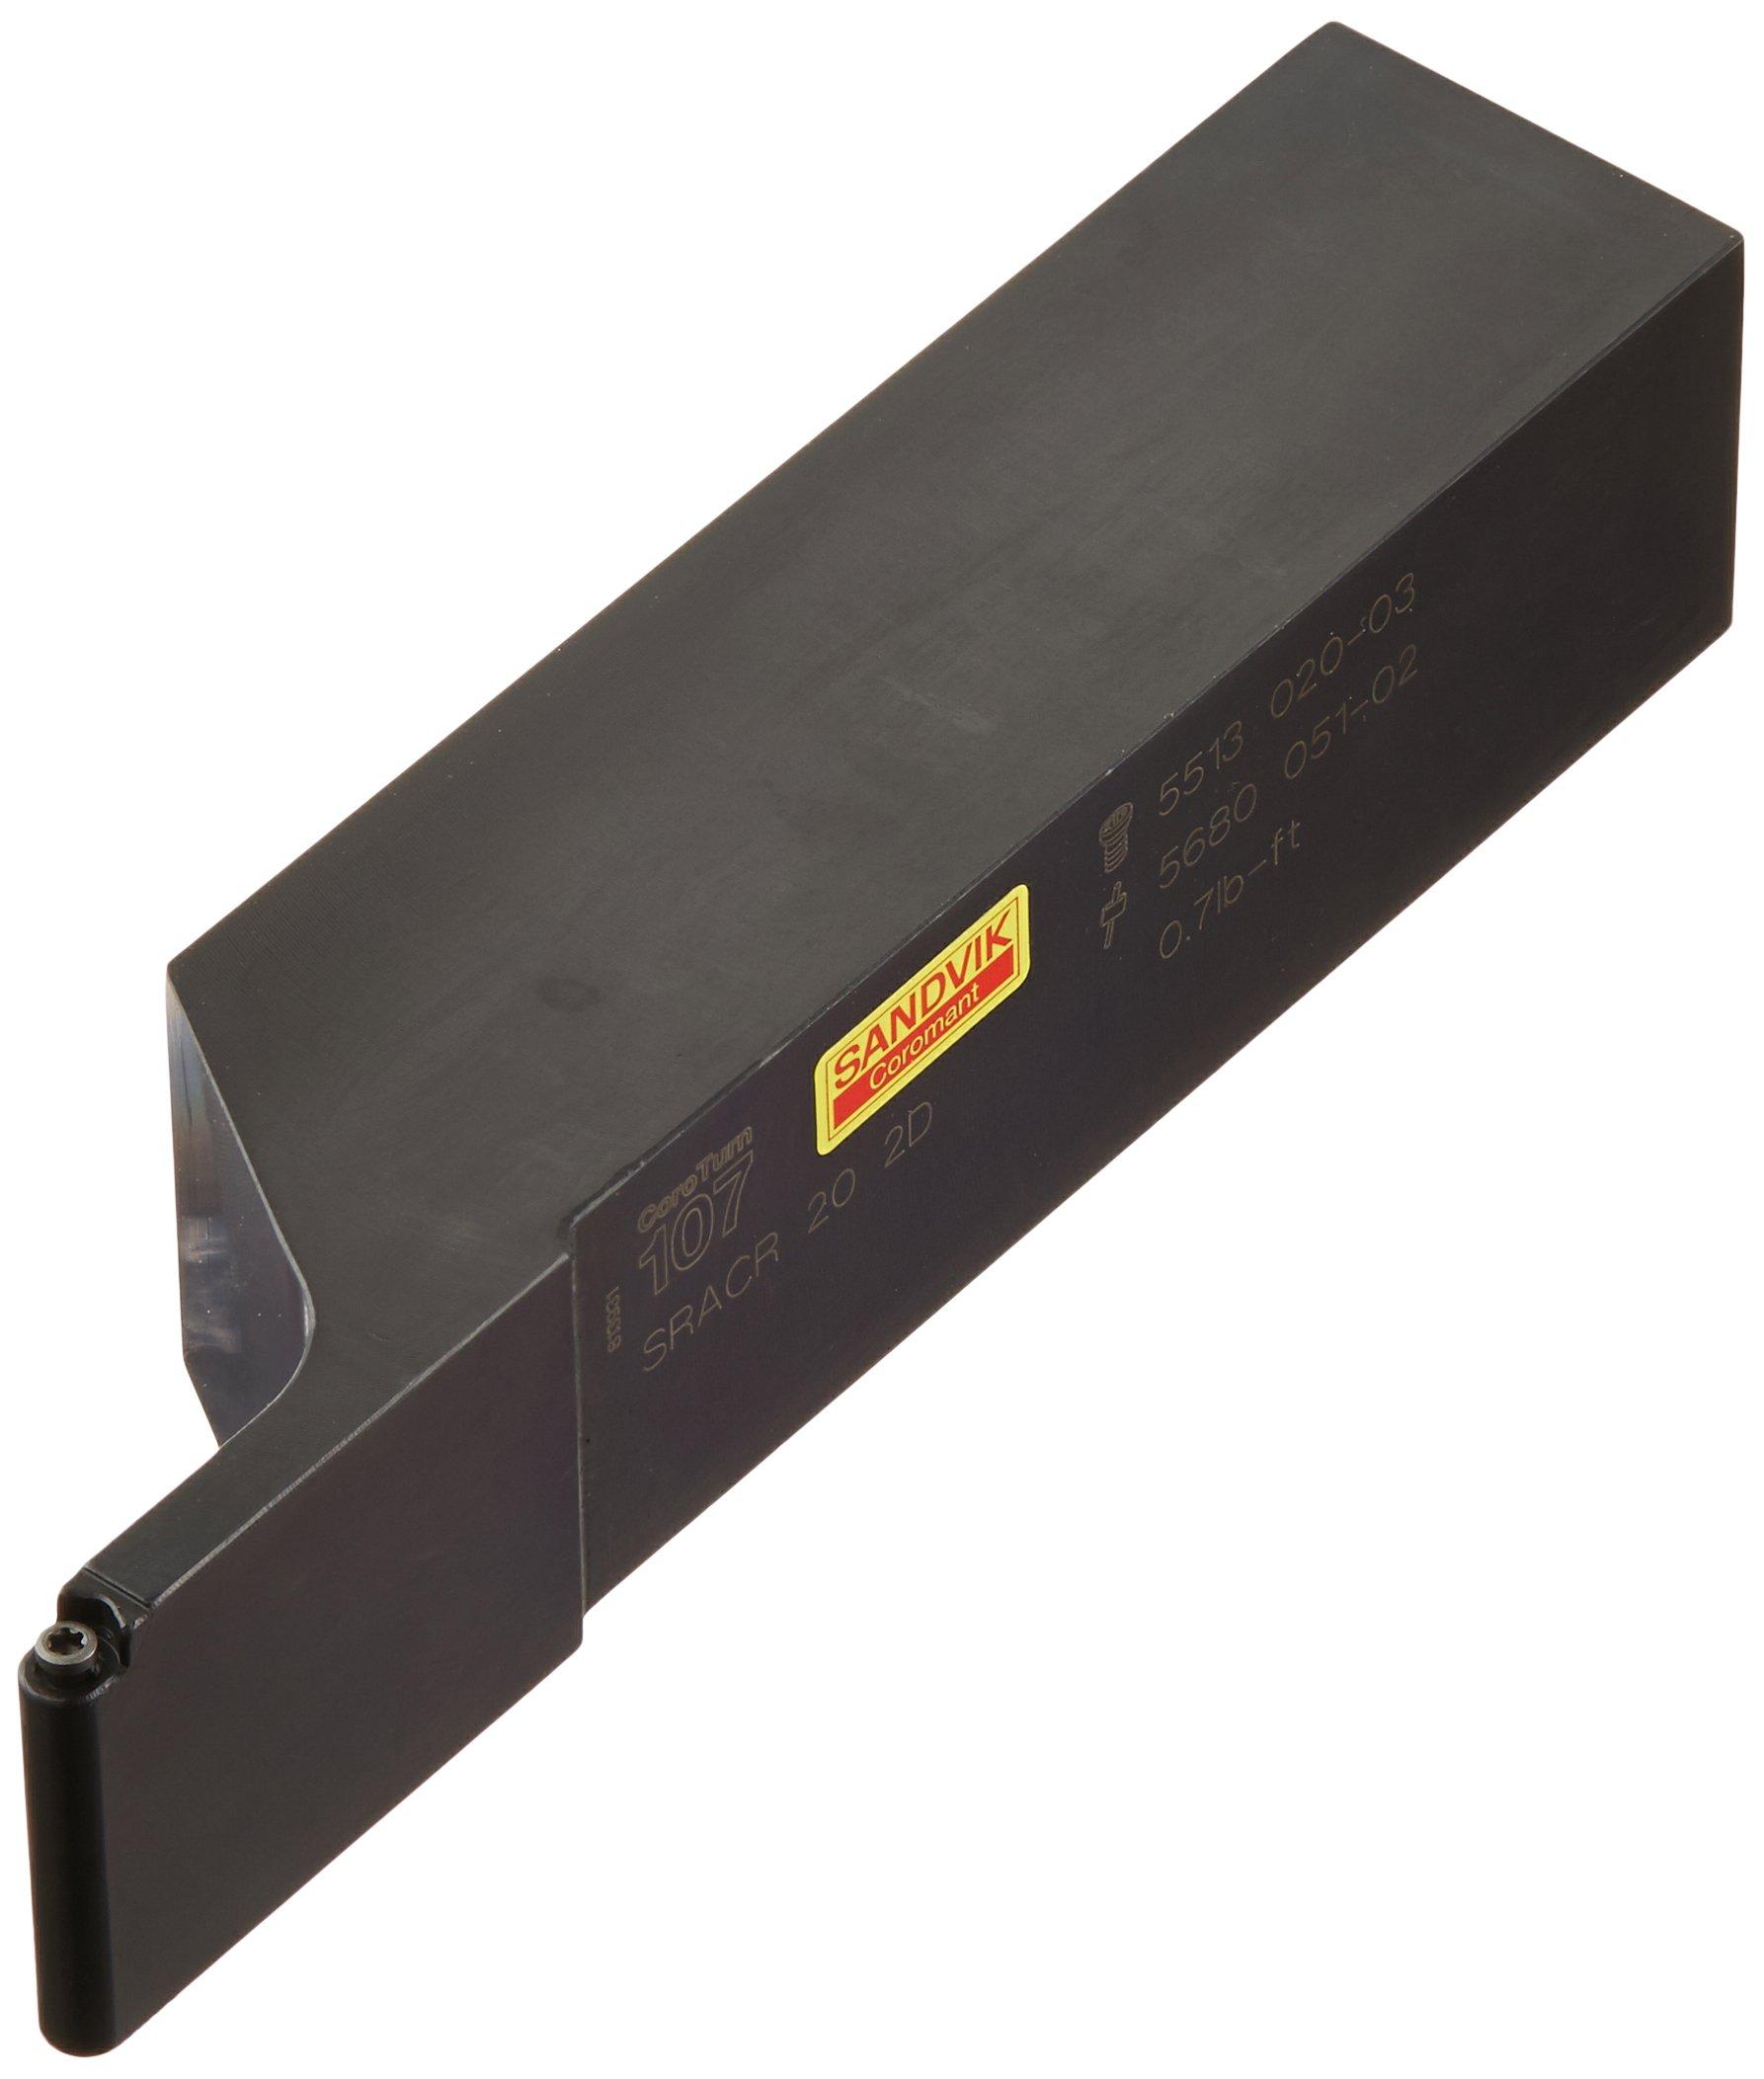 Sandvik Coromant SRACR 20 2D Turning Insert Holder, Square Shank, Steel, External, Screw Clamp, Right Hand, 1-1/4'' Width x 1-1/4'' Height Shank, 6'' Length x 1.3252'' Width, RCMT 22 Insert Size